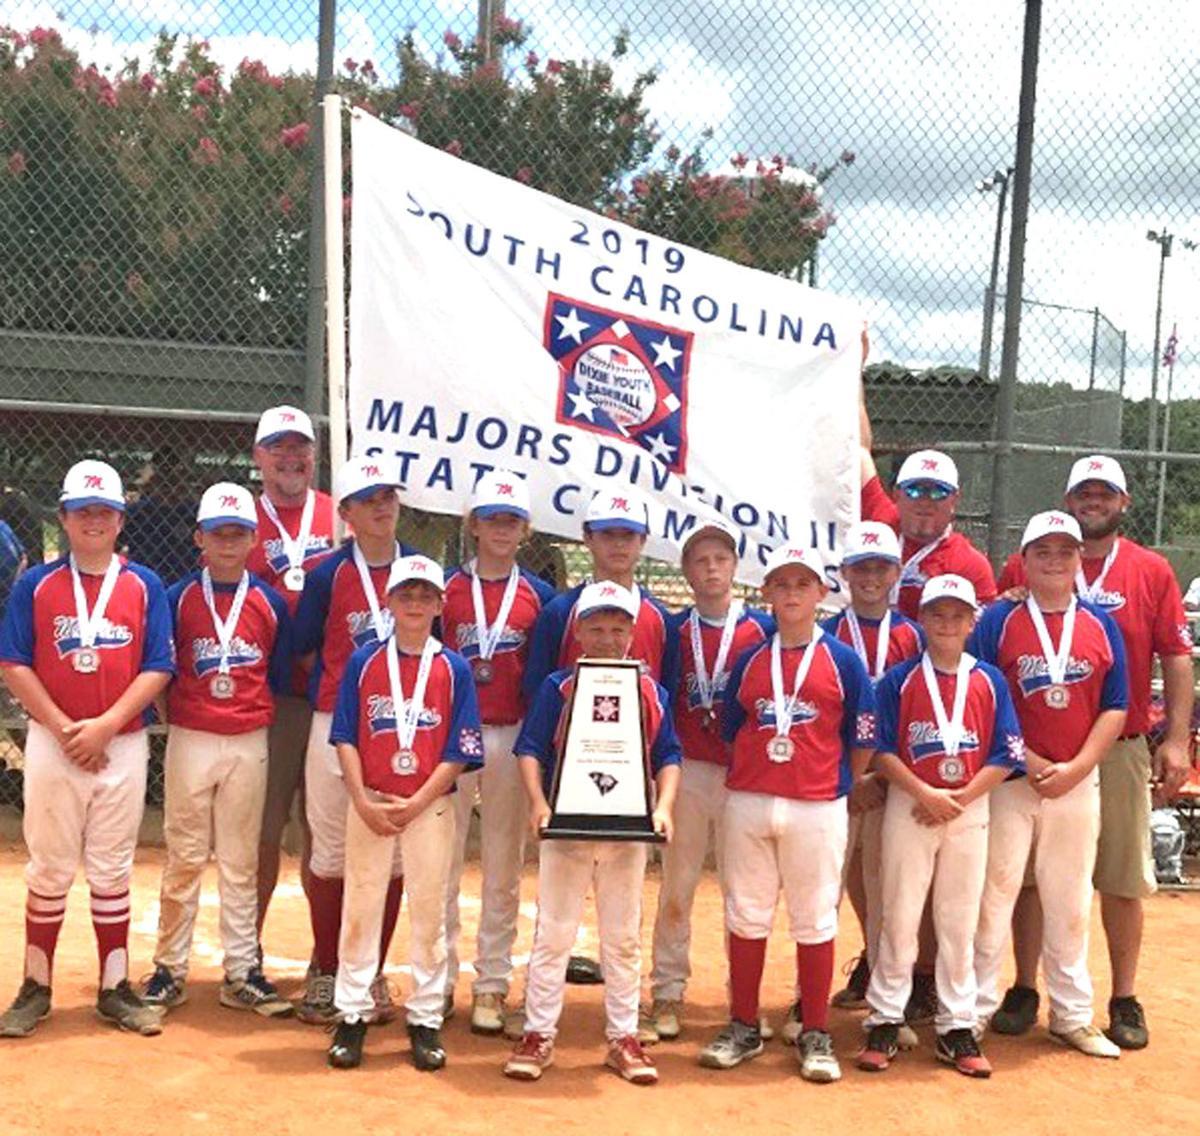 Mullins baseball all stars captures state championship